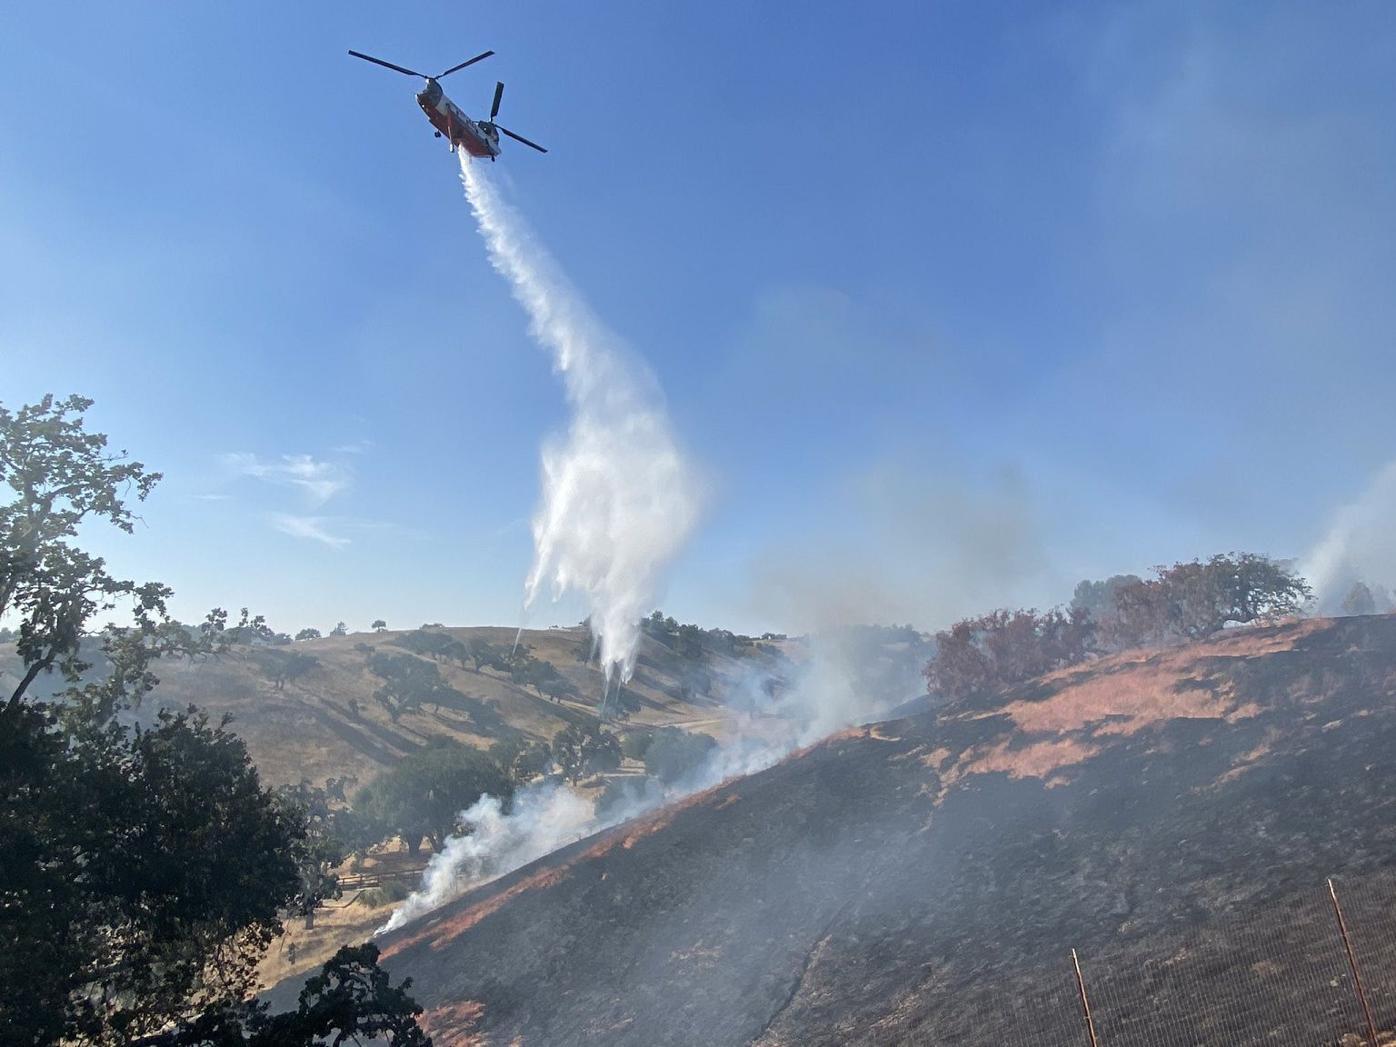 090621 Caballo fire big helo water drop.jpg